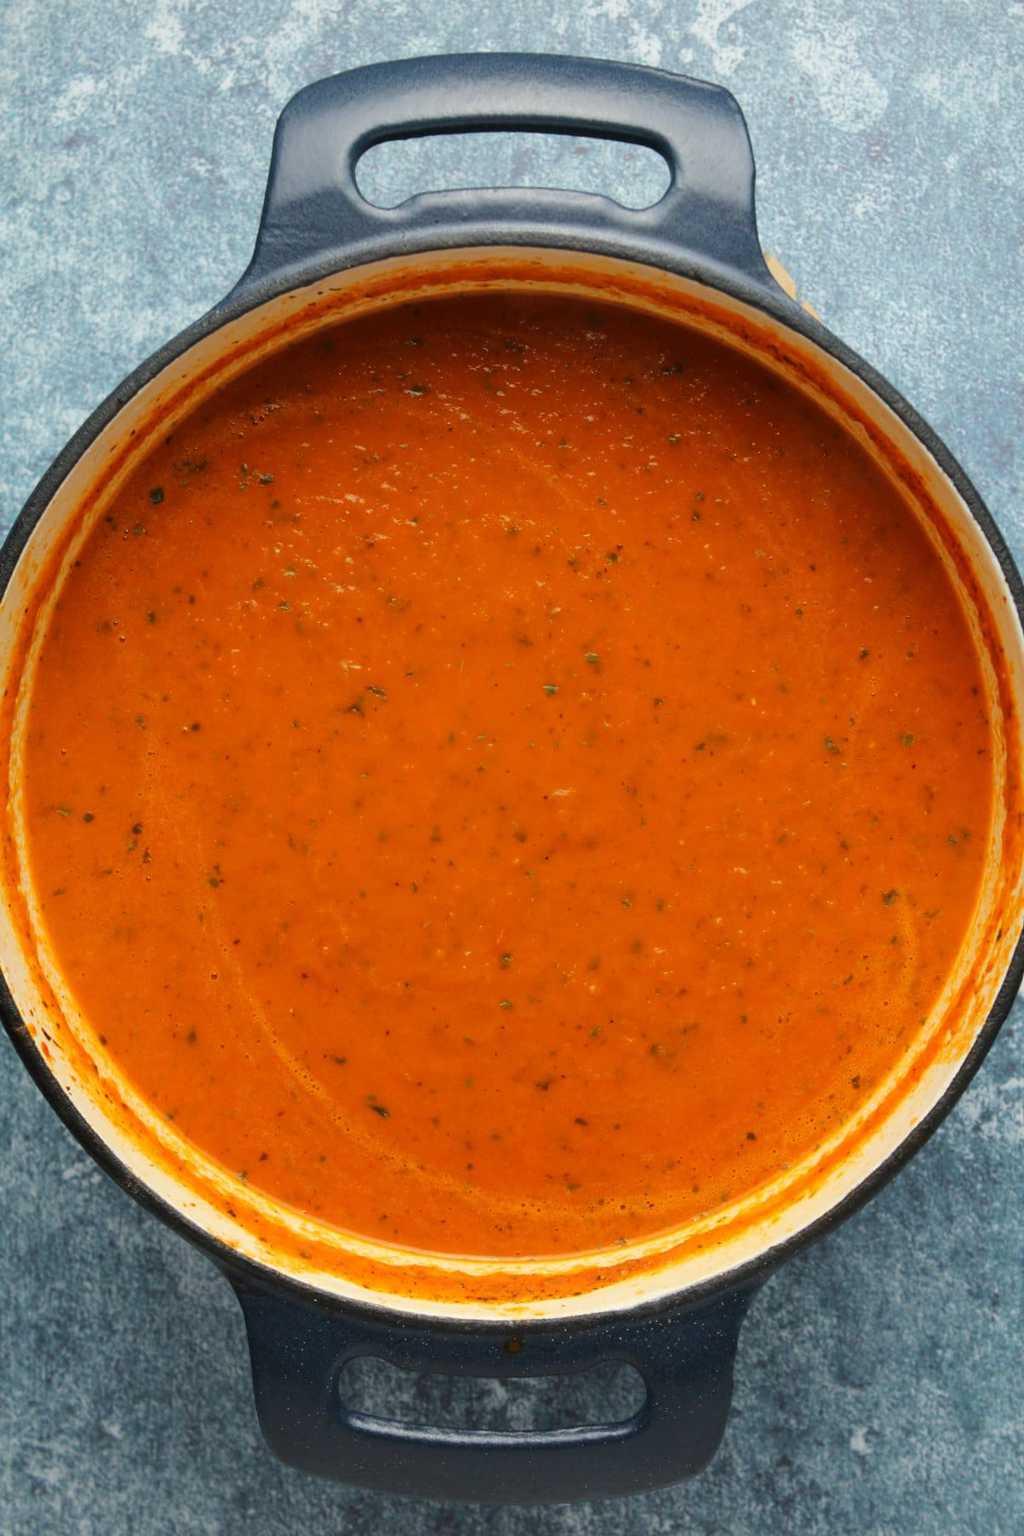 Vegan tomato basil soup in a cast iron pot.